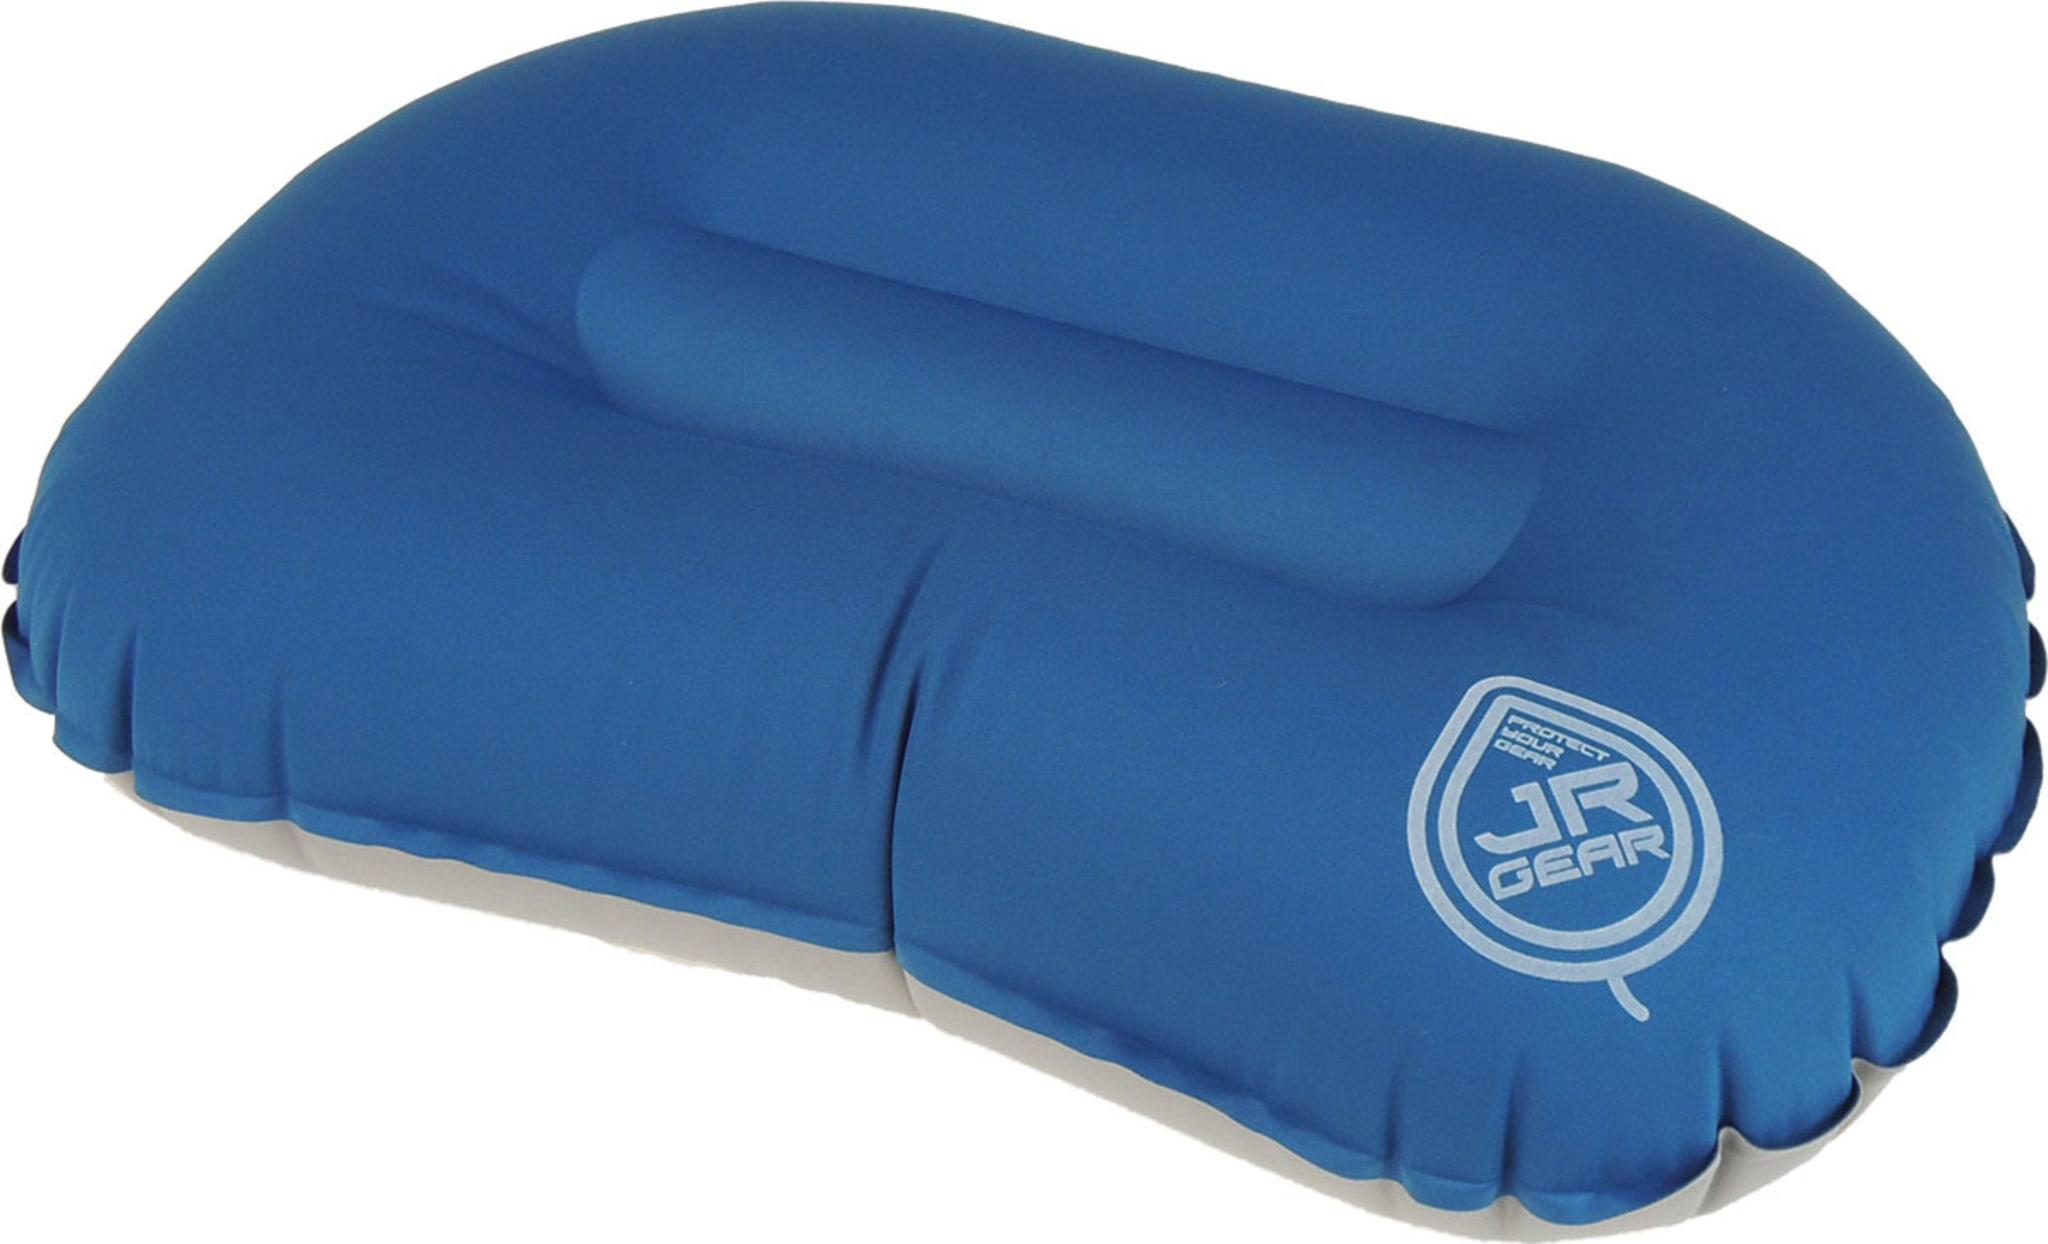 Lett oppblåsbar pute som passer inni hetta på soveposen